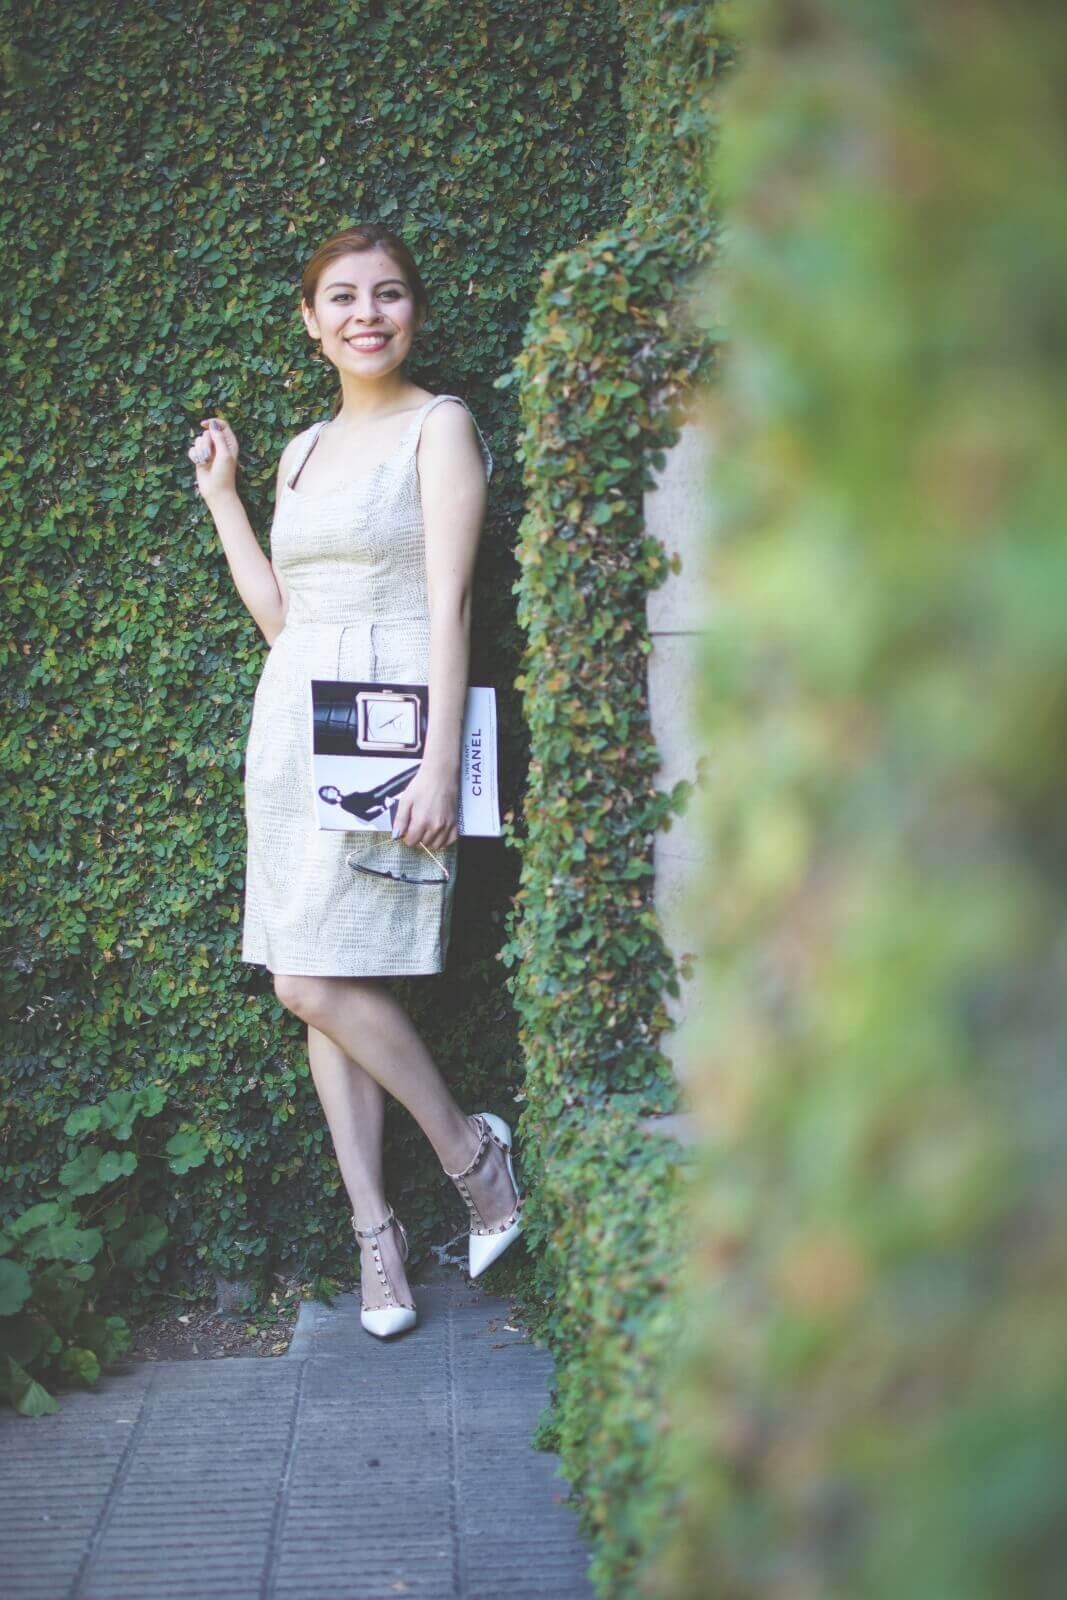 almond-white-dress-sammydress-stilettos-valentino-rockstud-imitation-deborah-ferrero-style-by-deb-ladylike17